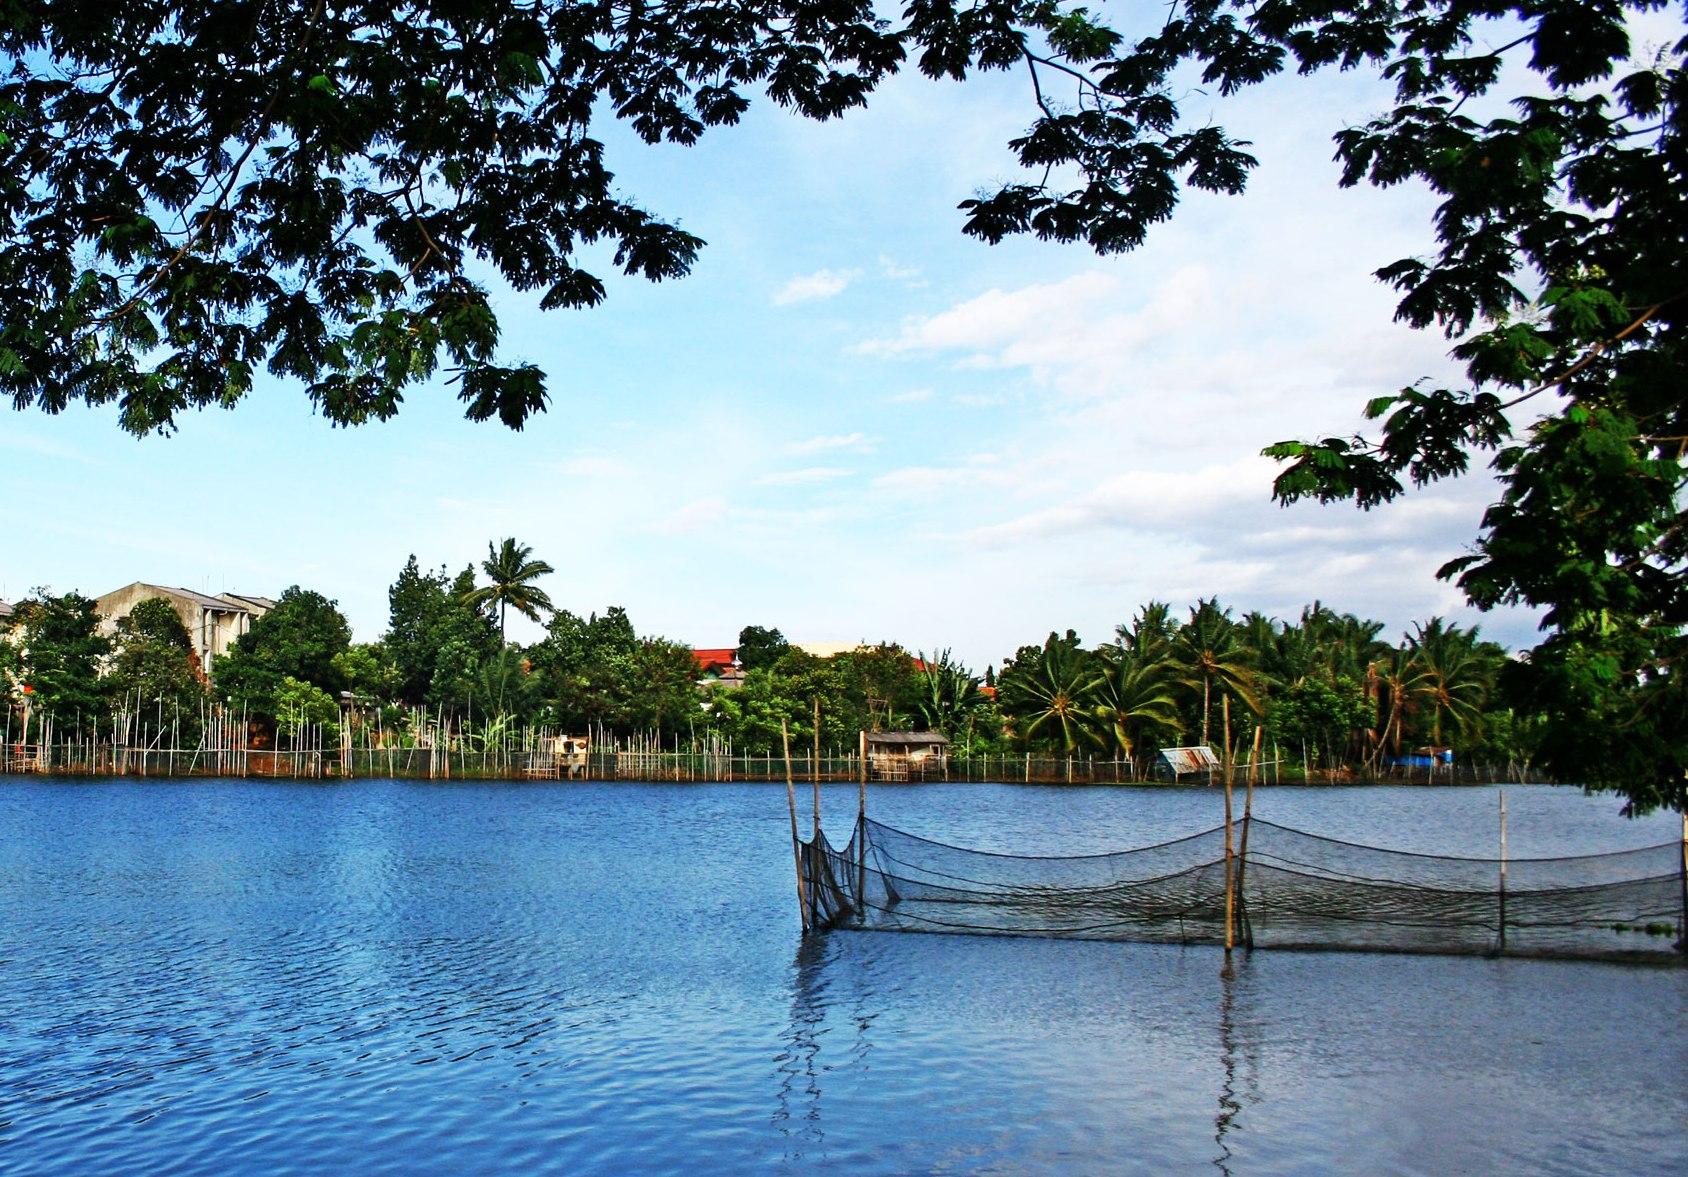 Memancing Mujair Pamulang Wisata Jakarta Musium Lengkong Kota Tangerang Selatan